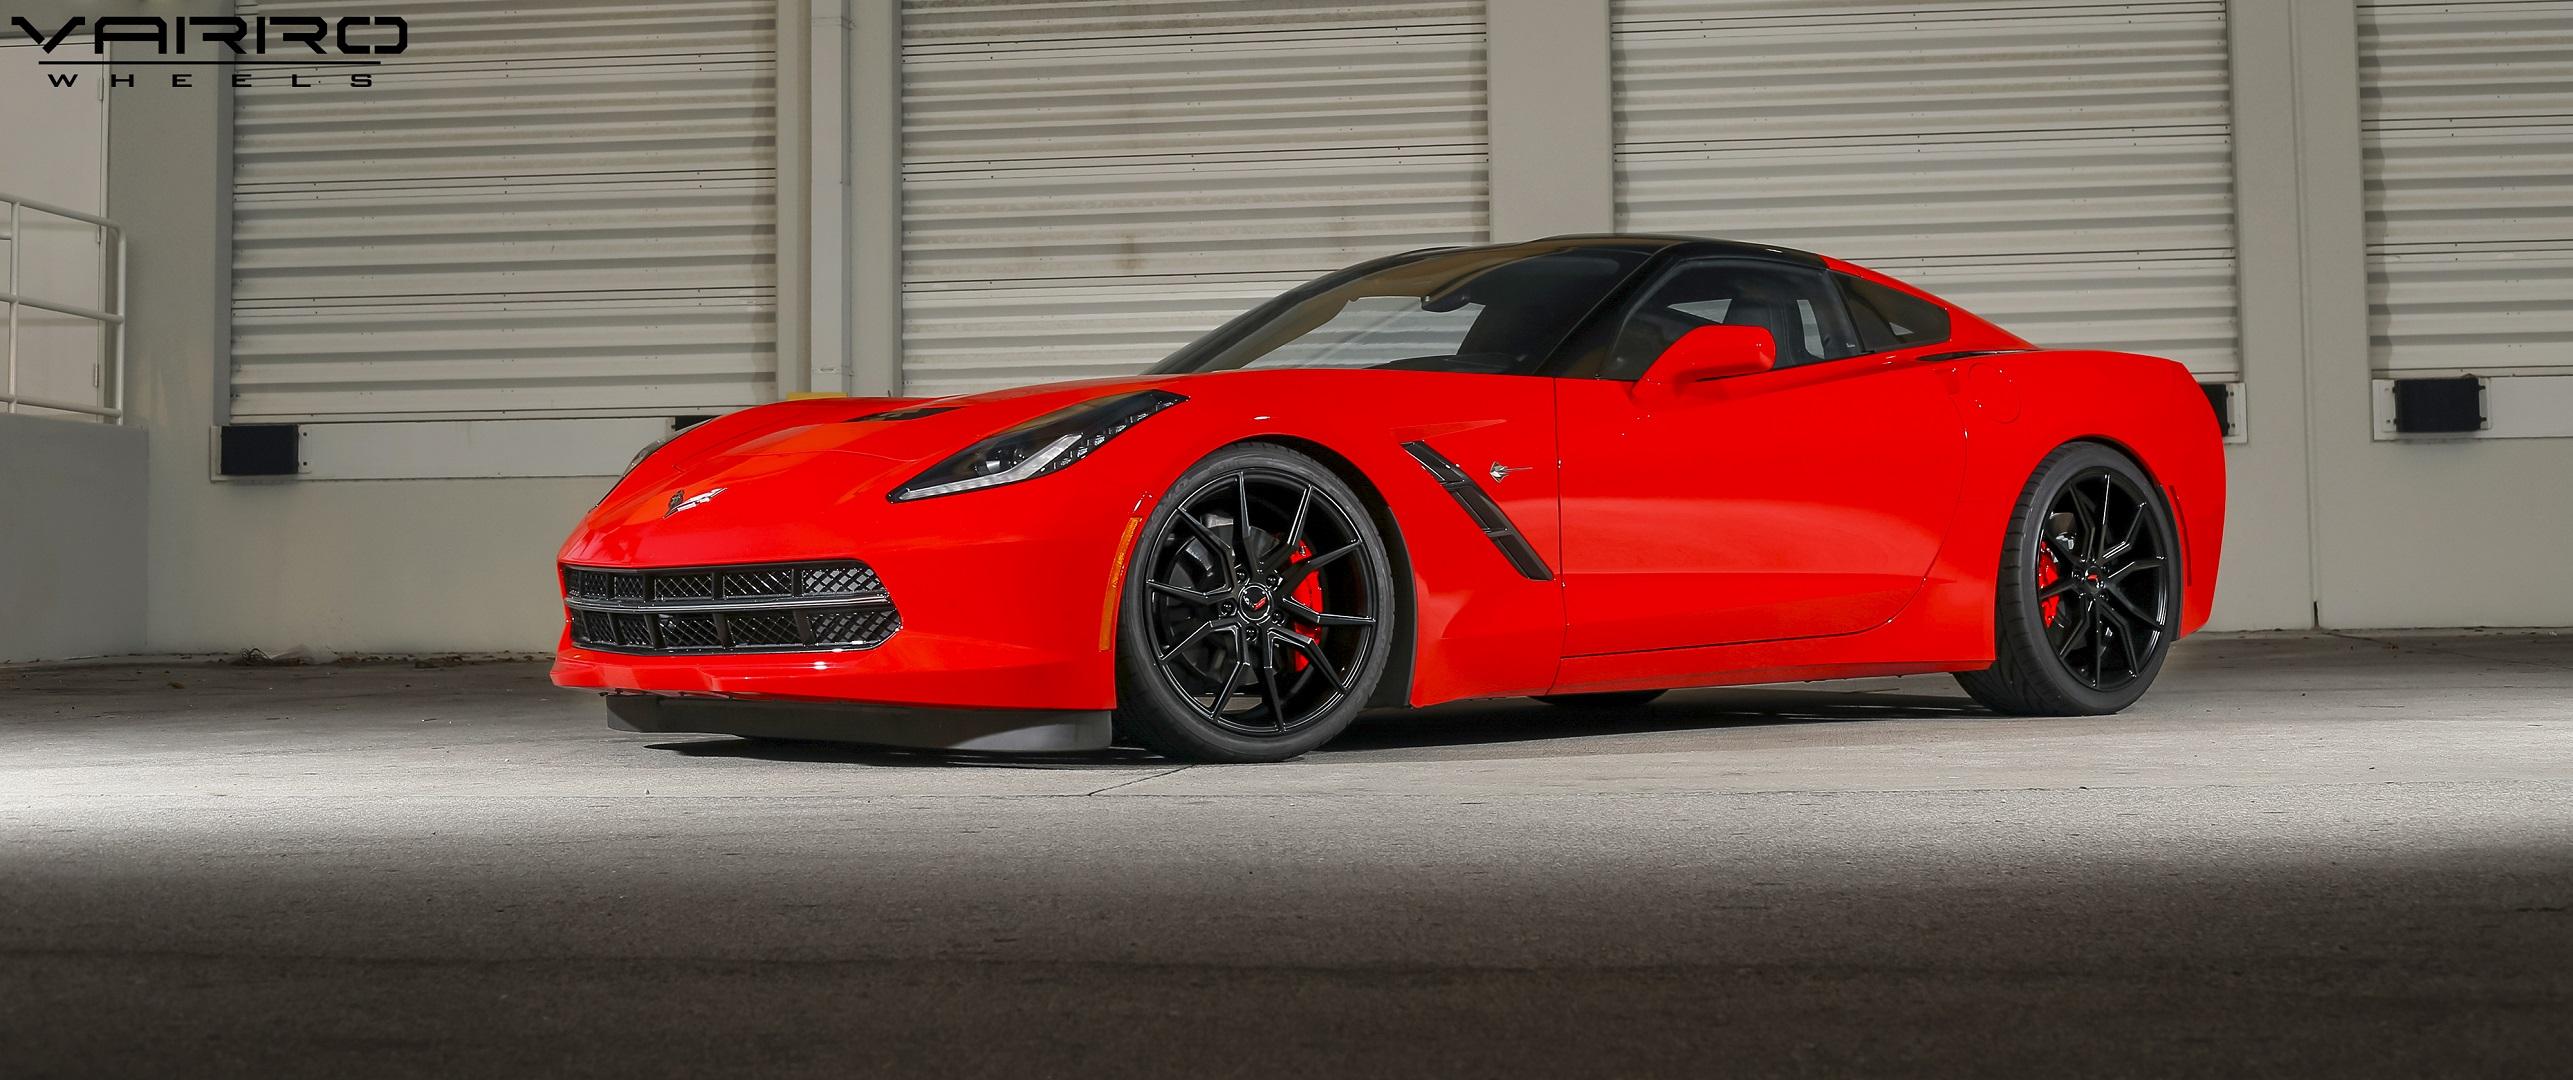 Corvette Stingray Black Rims Varro Staggered VD19 Wheels